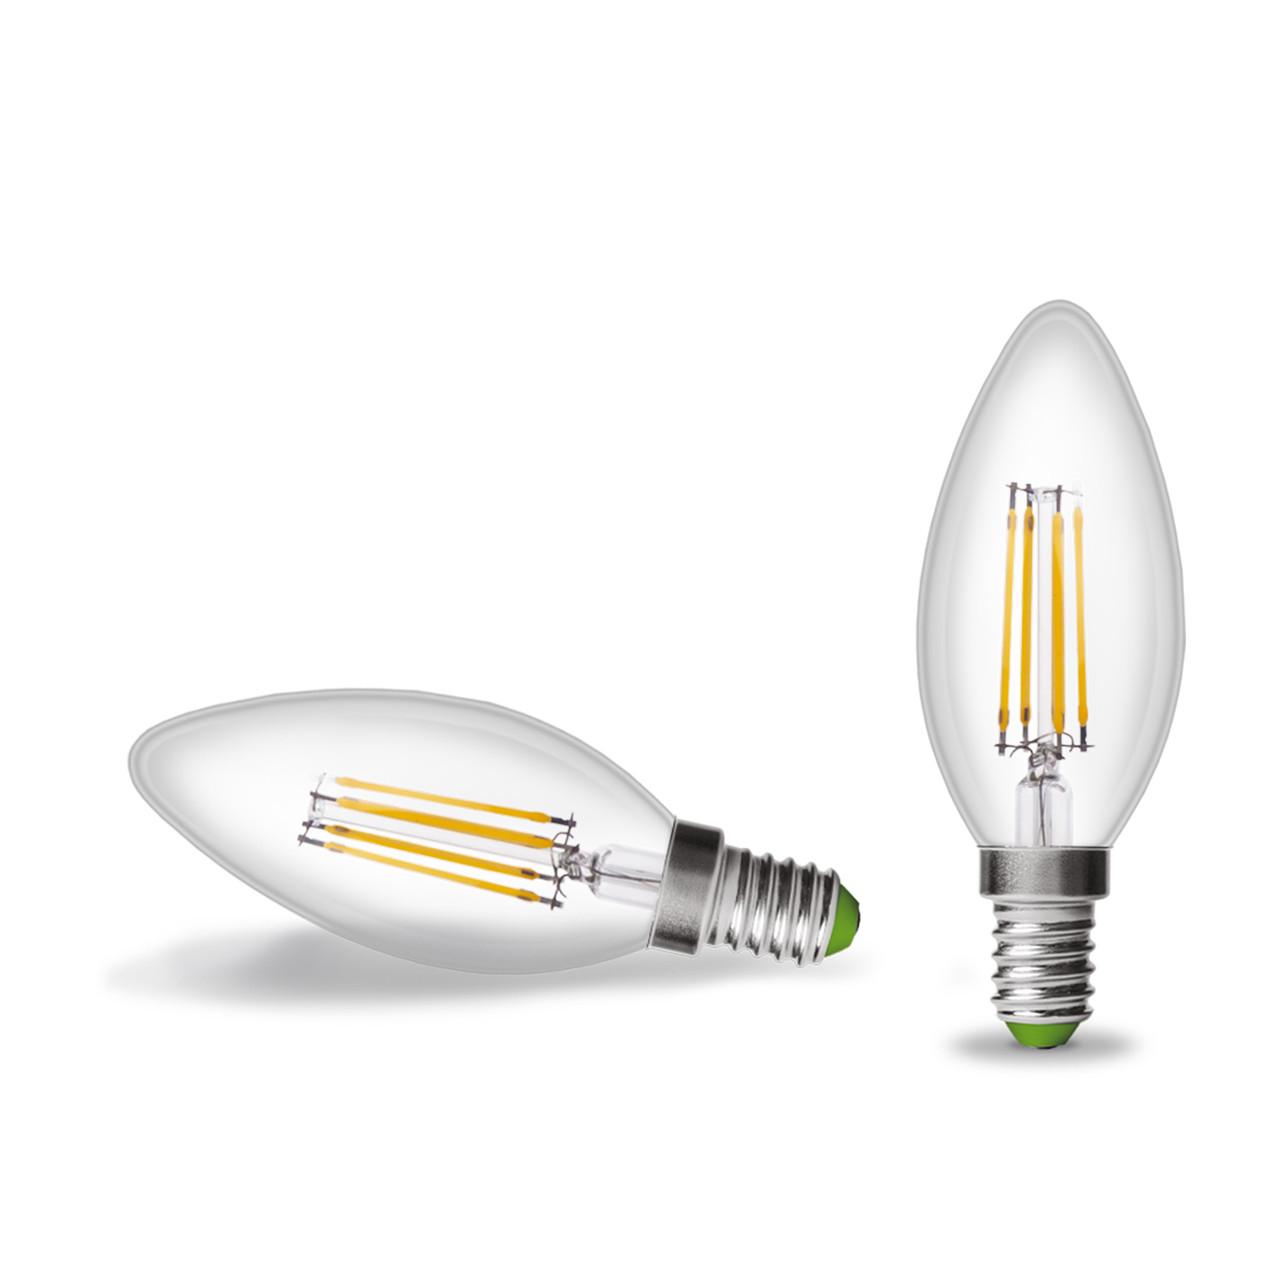 EUROLAMP LED Лампа Свеча ArtDeco 4W E14 2700K (прозрачная), фото 1